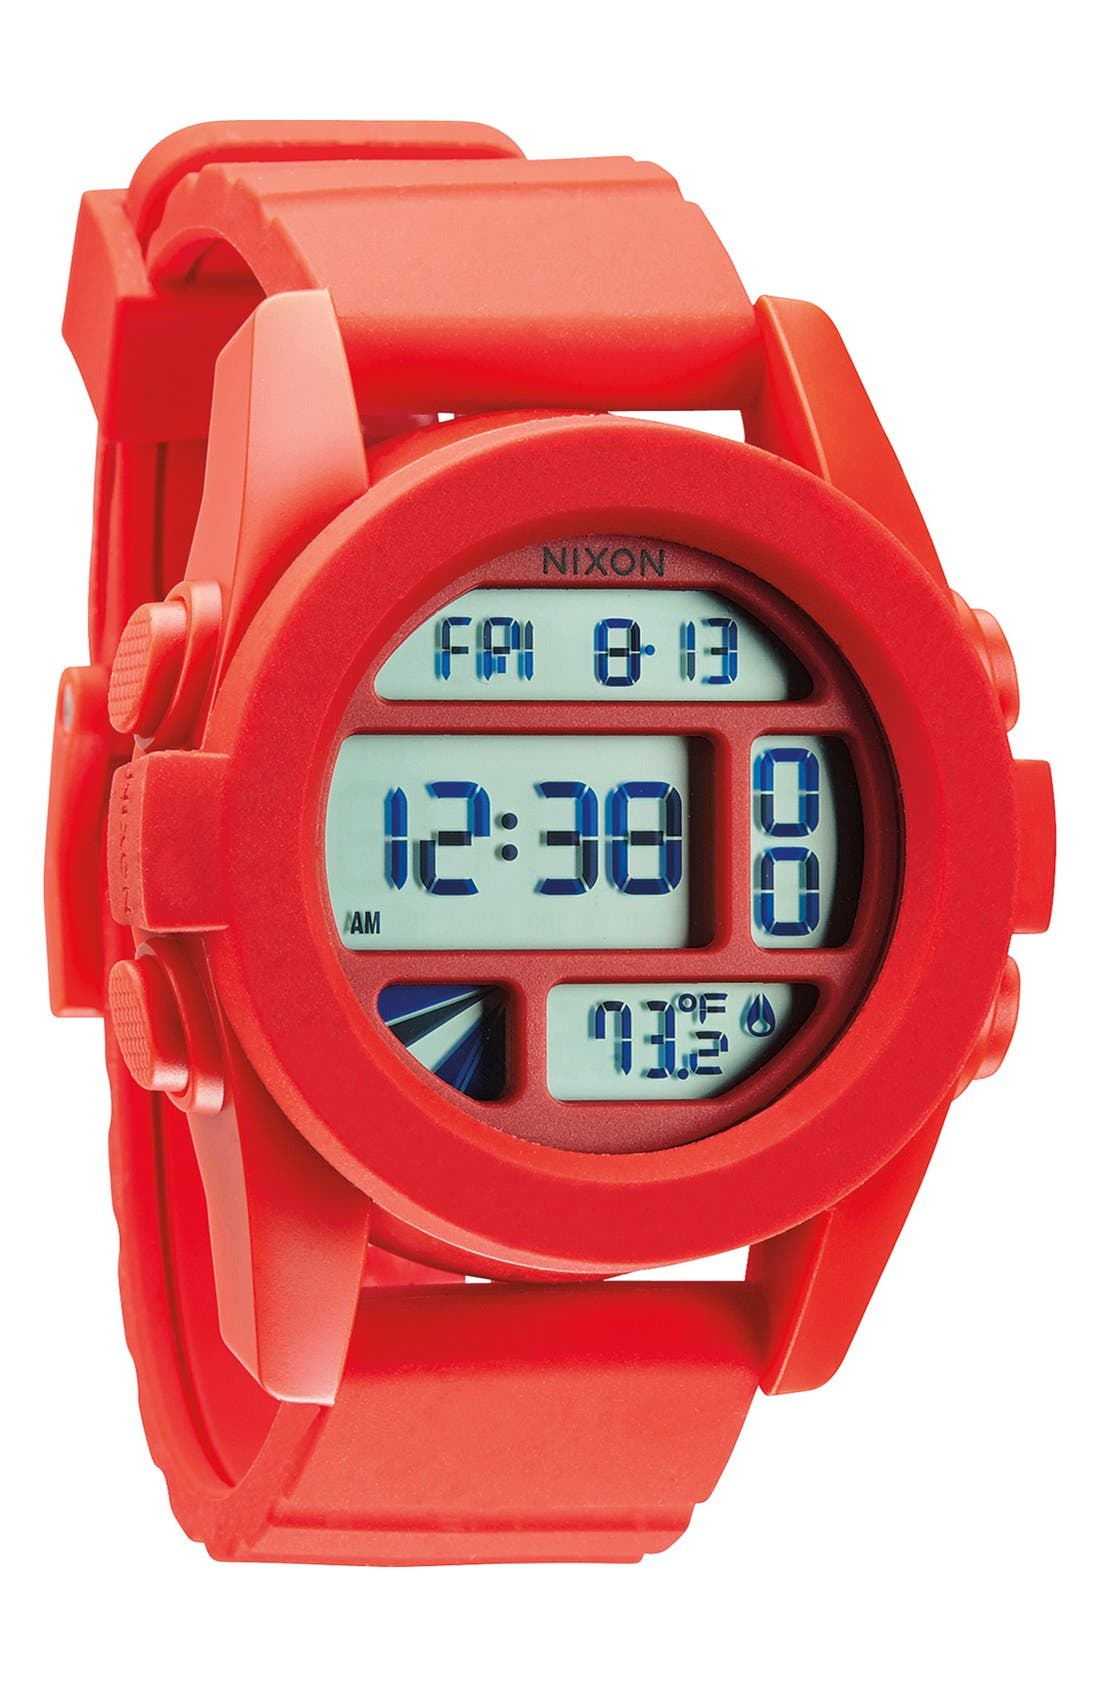 Main Image - Nixon 'The Unit' Round Digital Watch, 44mm